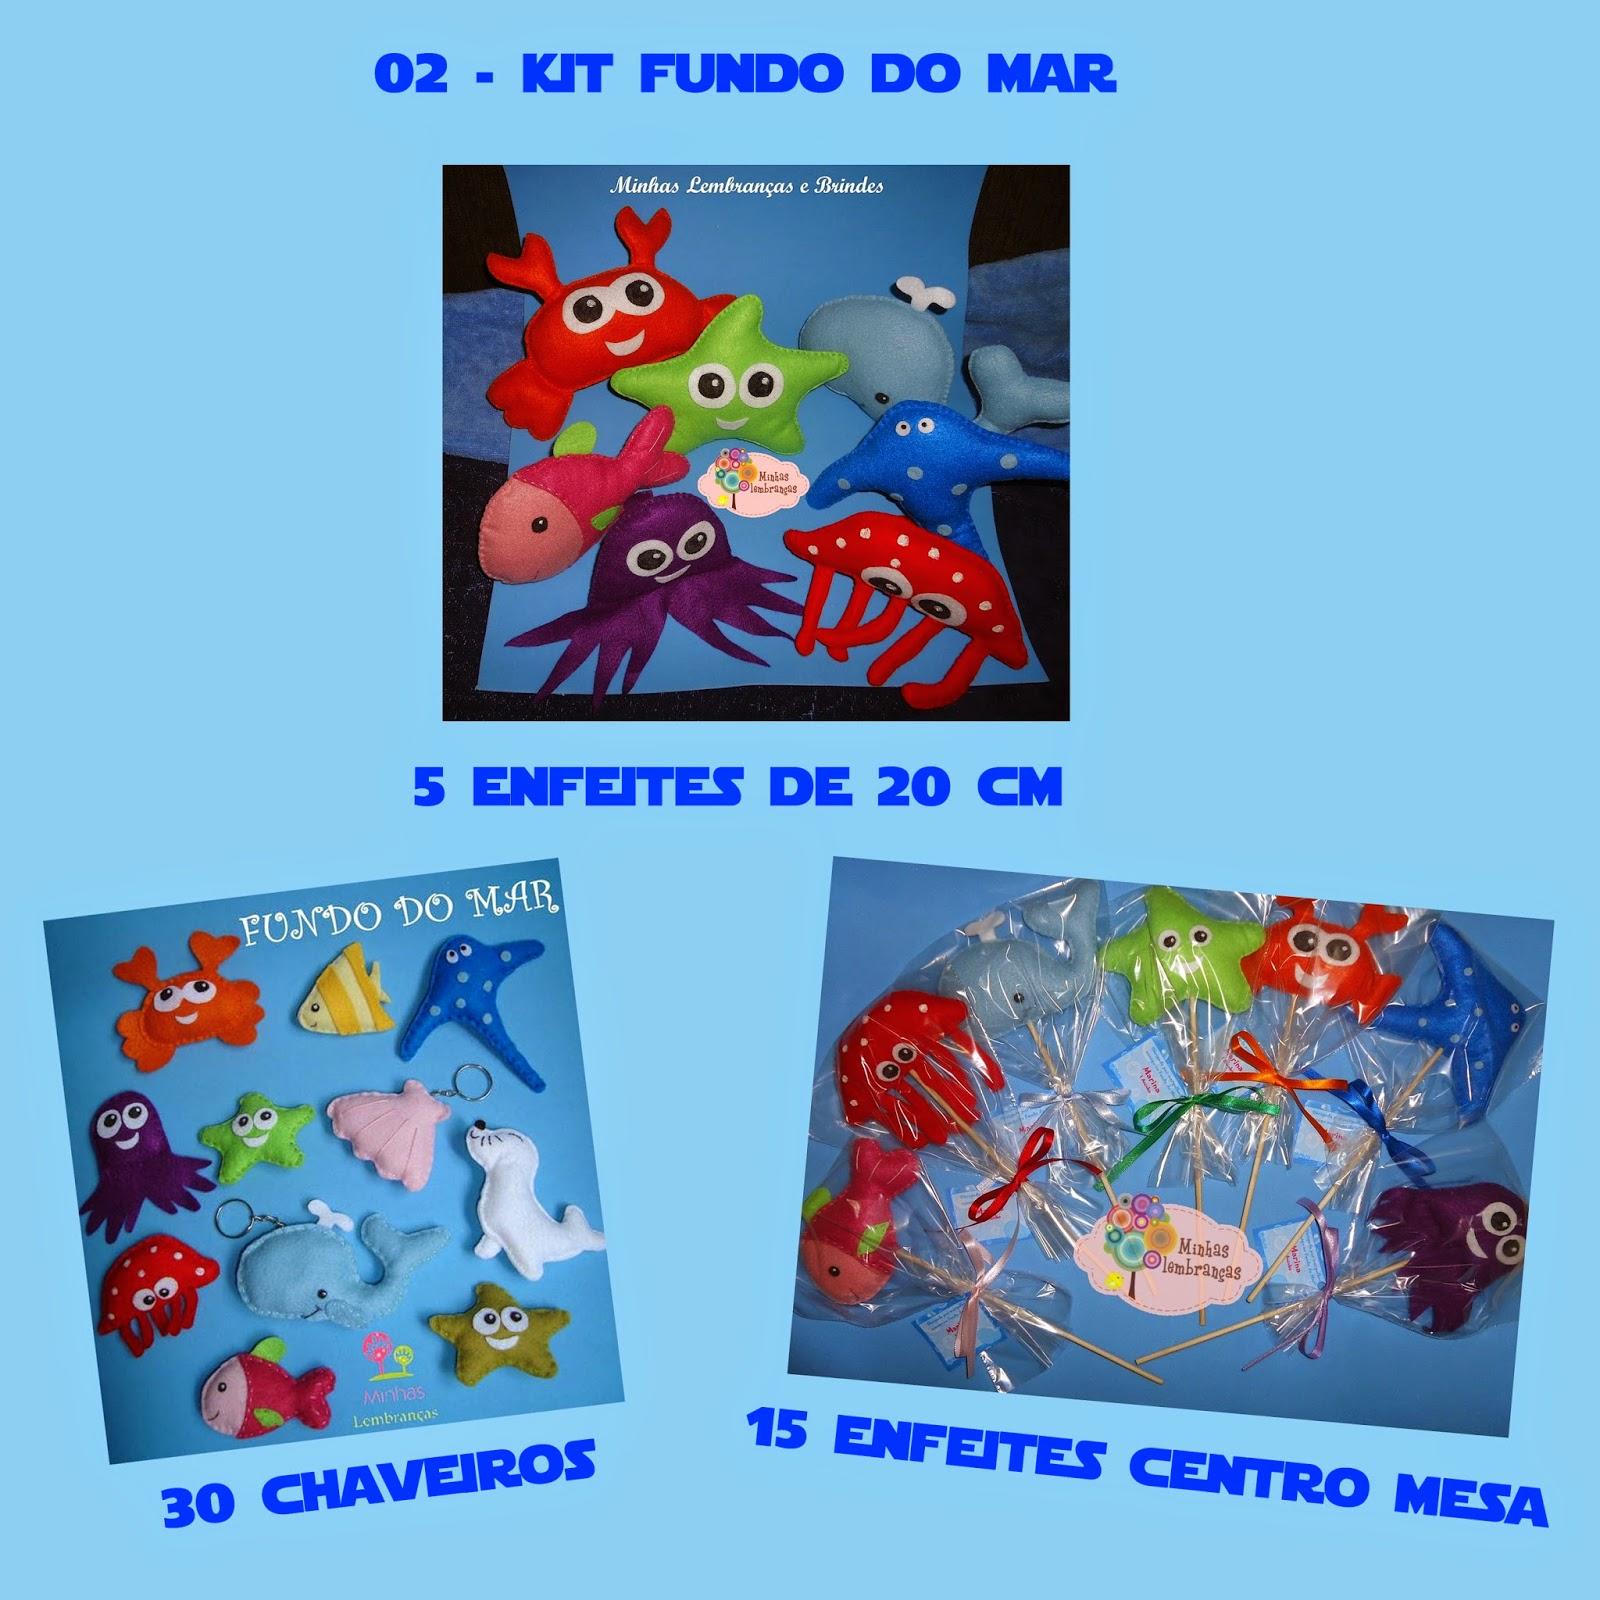 fundo-do-mar-kit-festa2-feltro-lembrancinhas-brinde